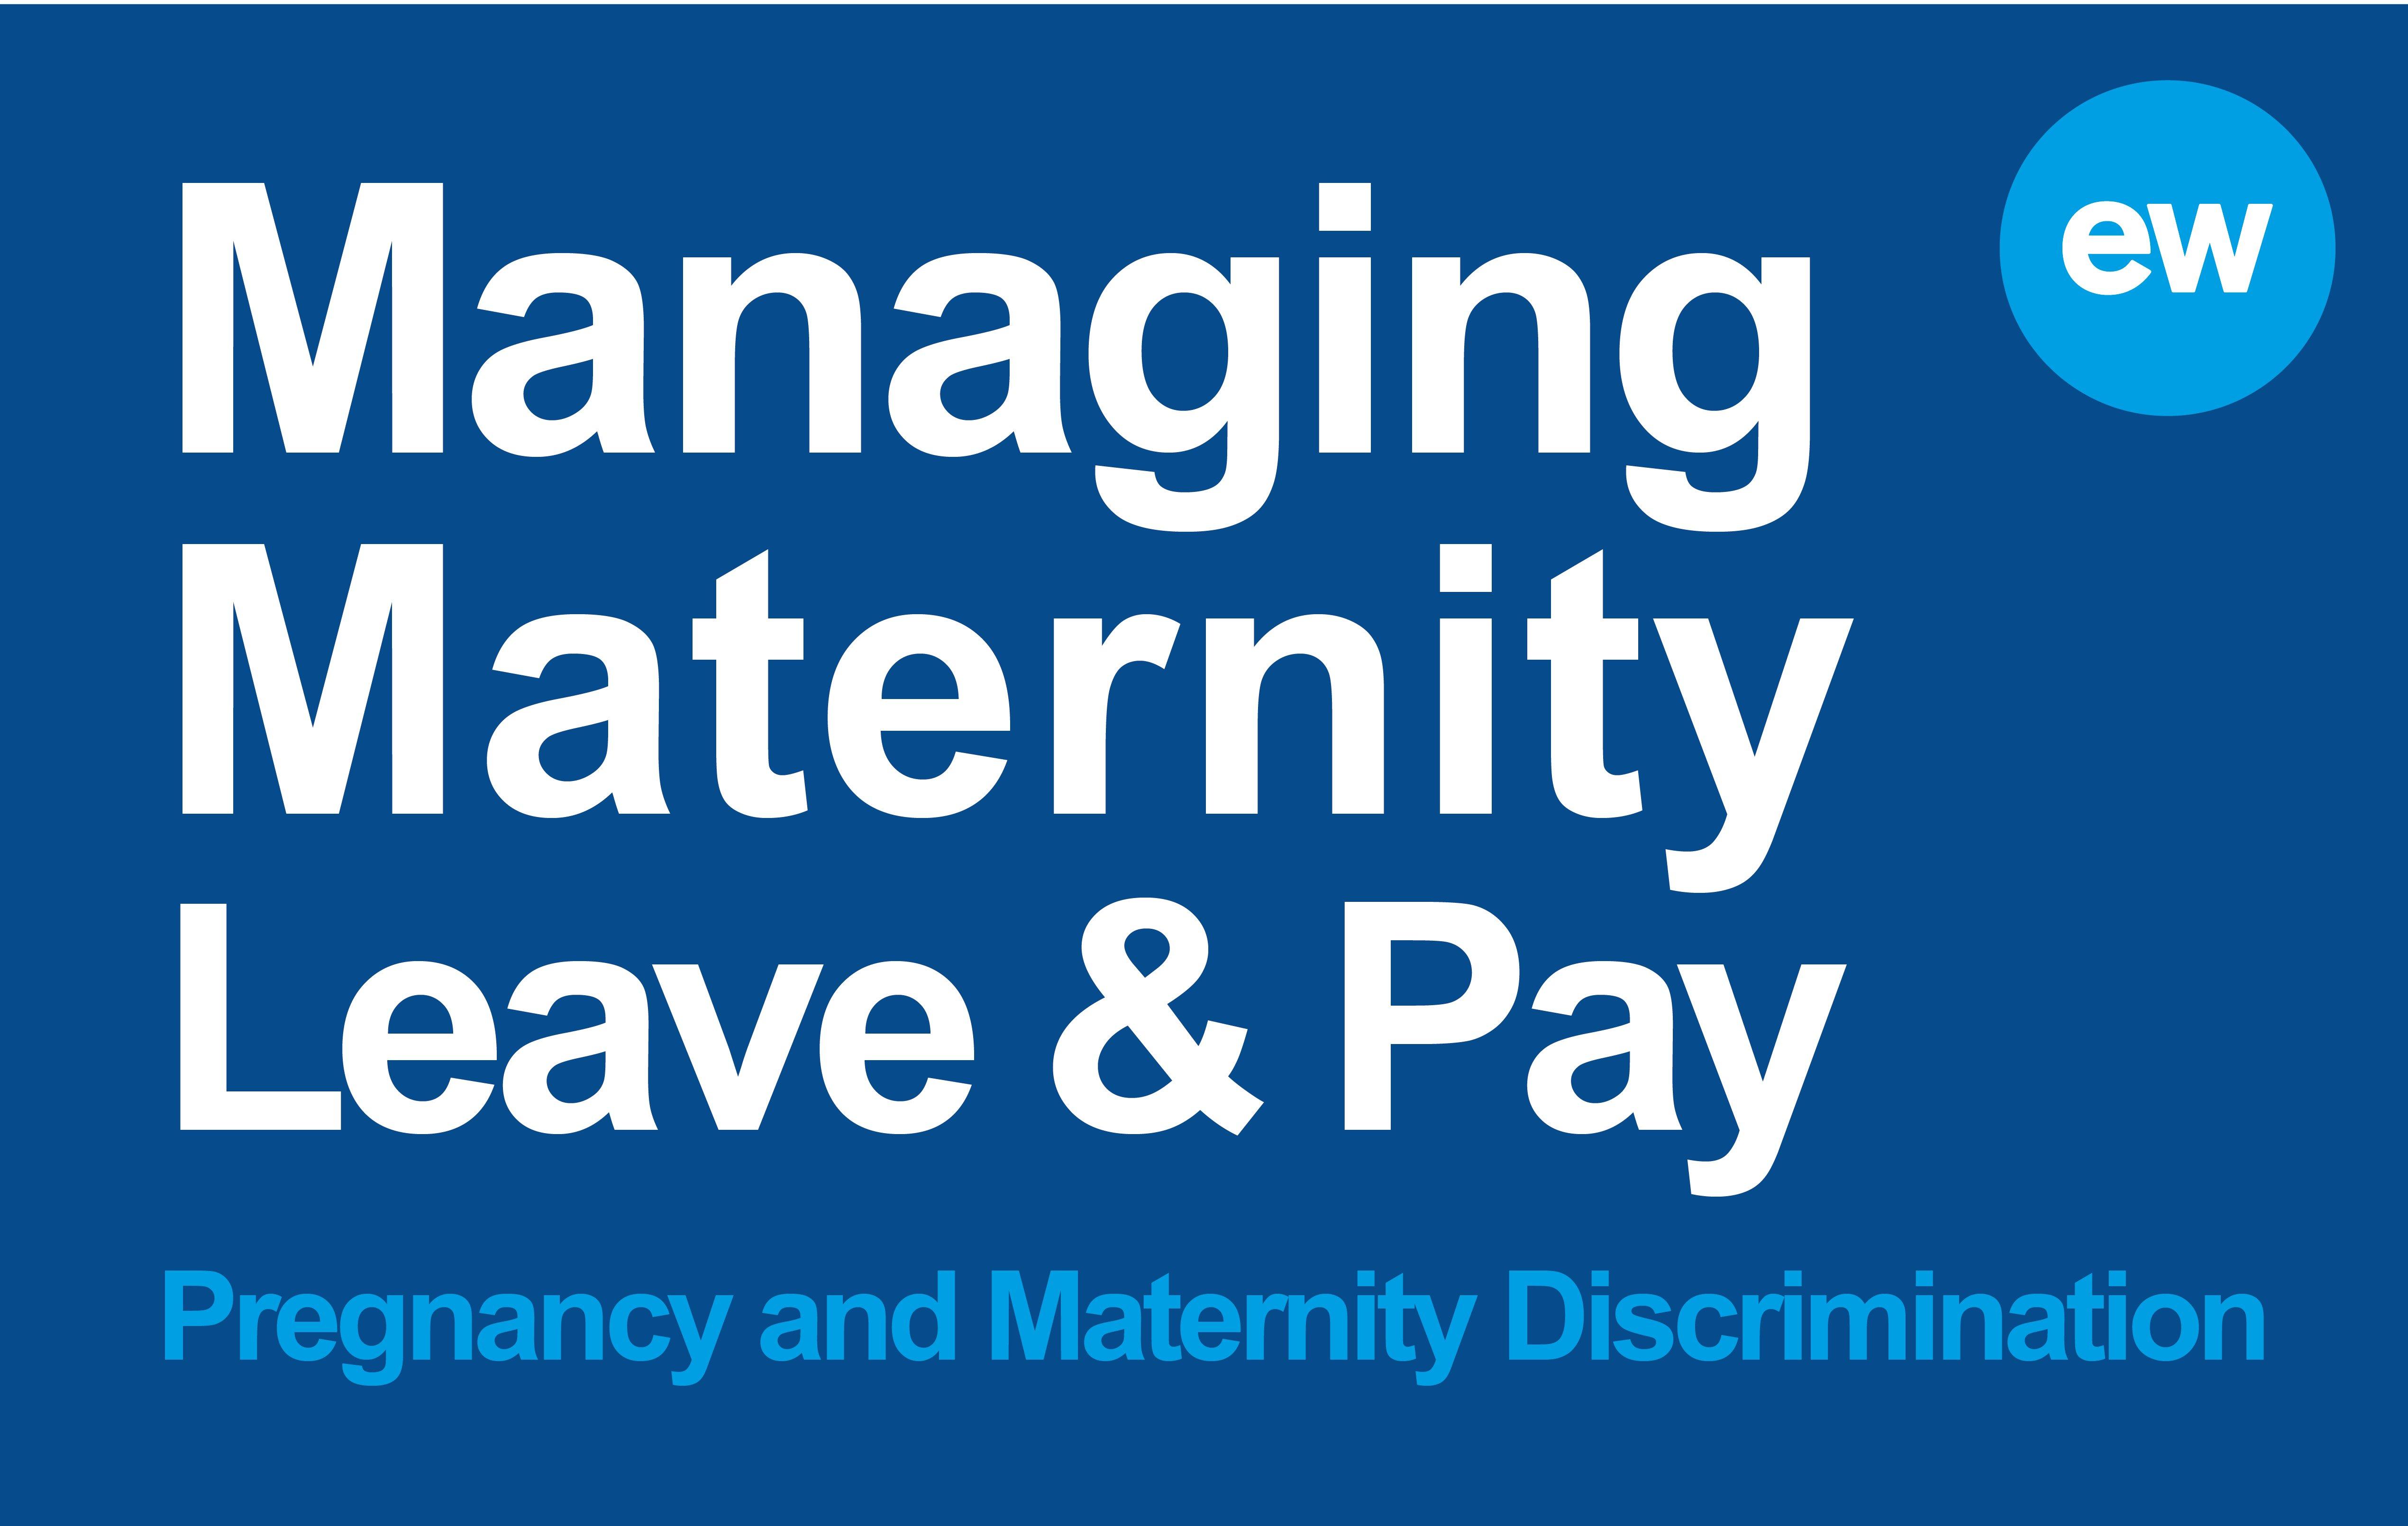 pregnancy and maternity discrimination